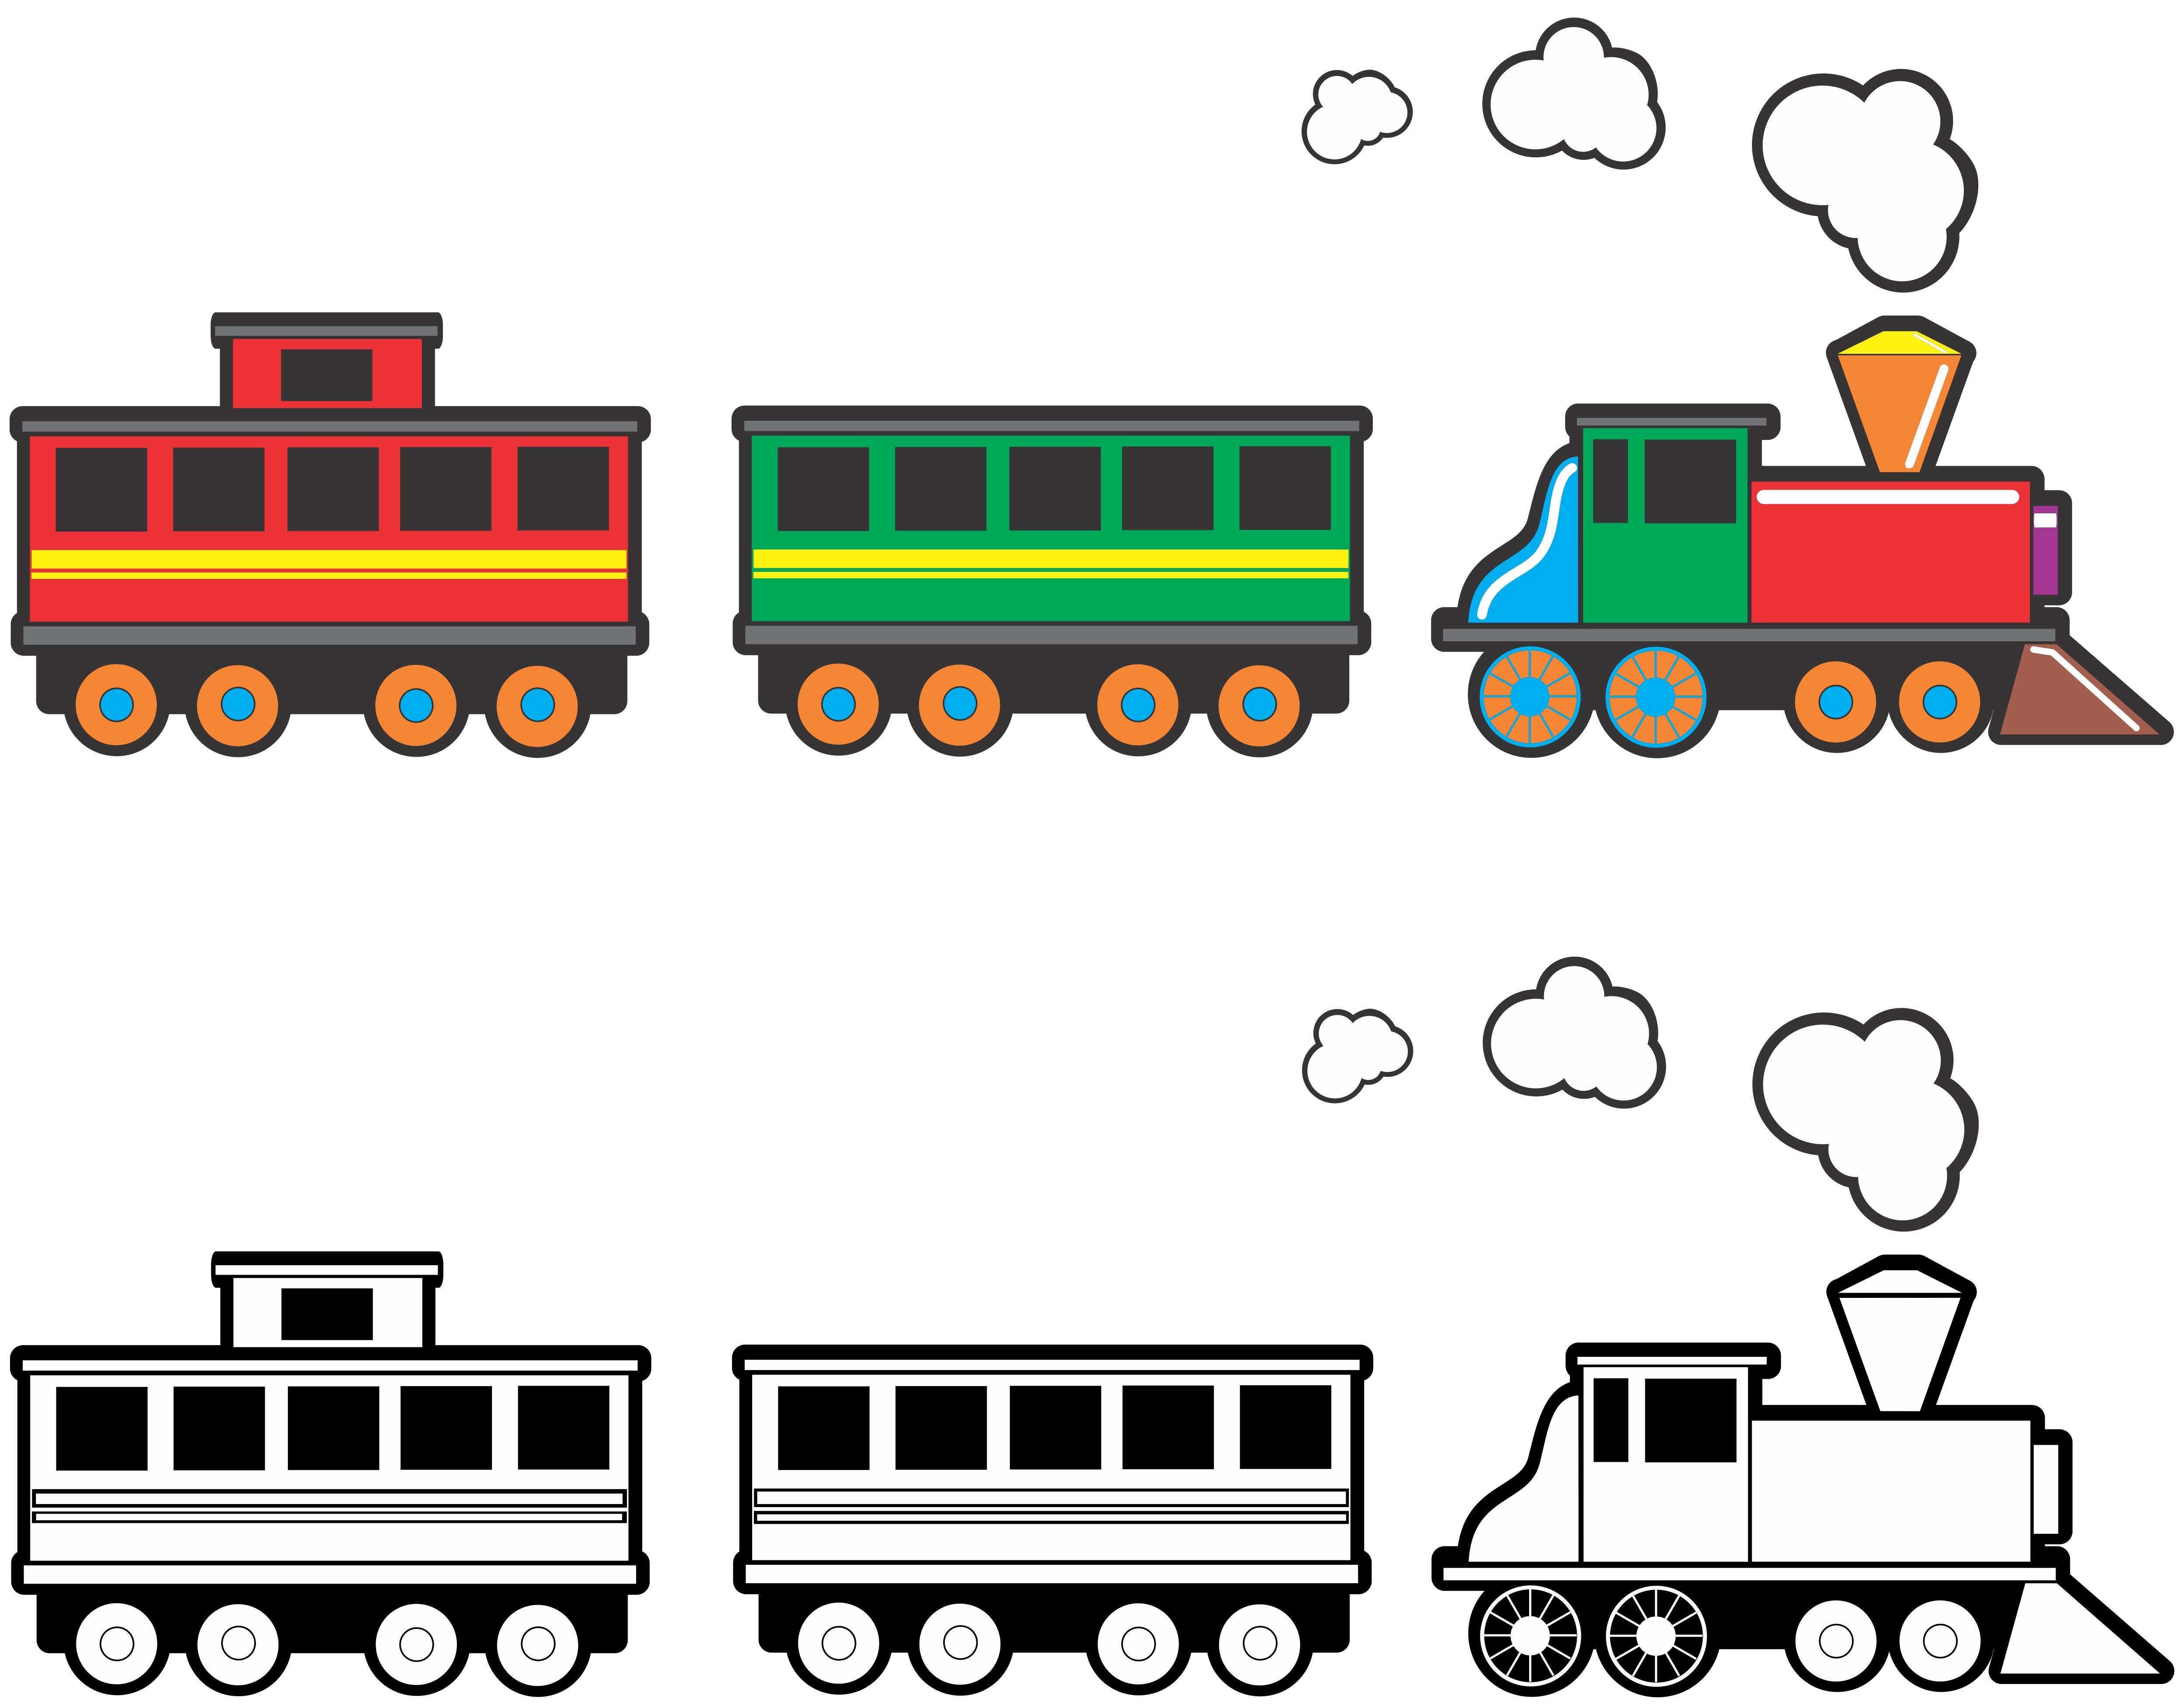 Free Cartoon Train Pics Download Free Clip Art Free Clip Art On Clipart Library